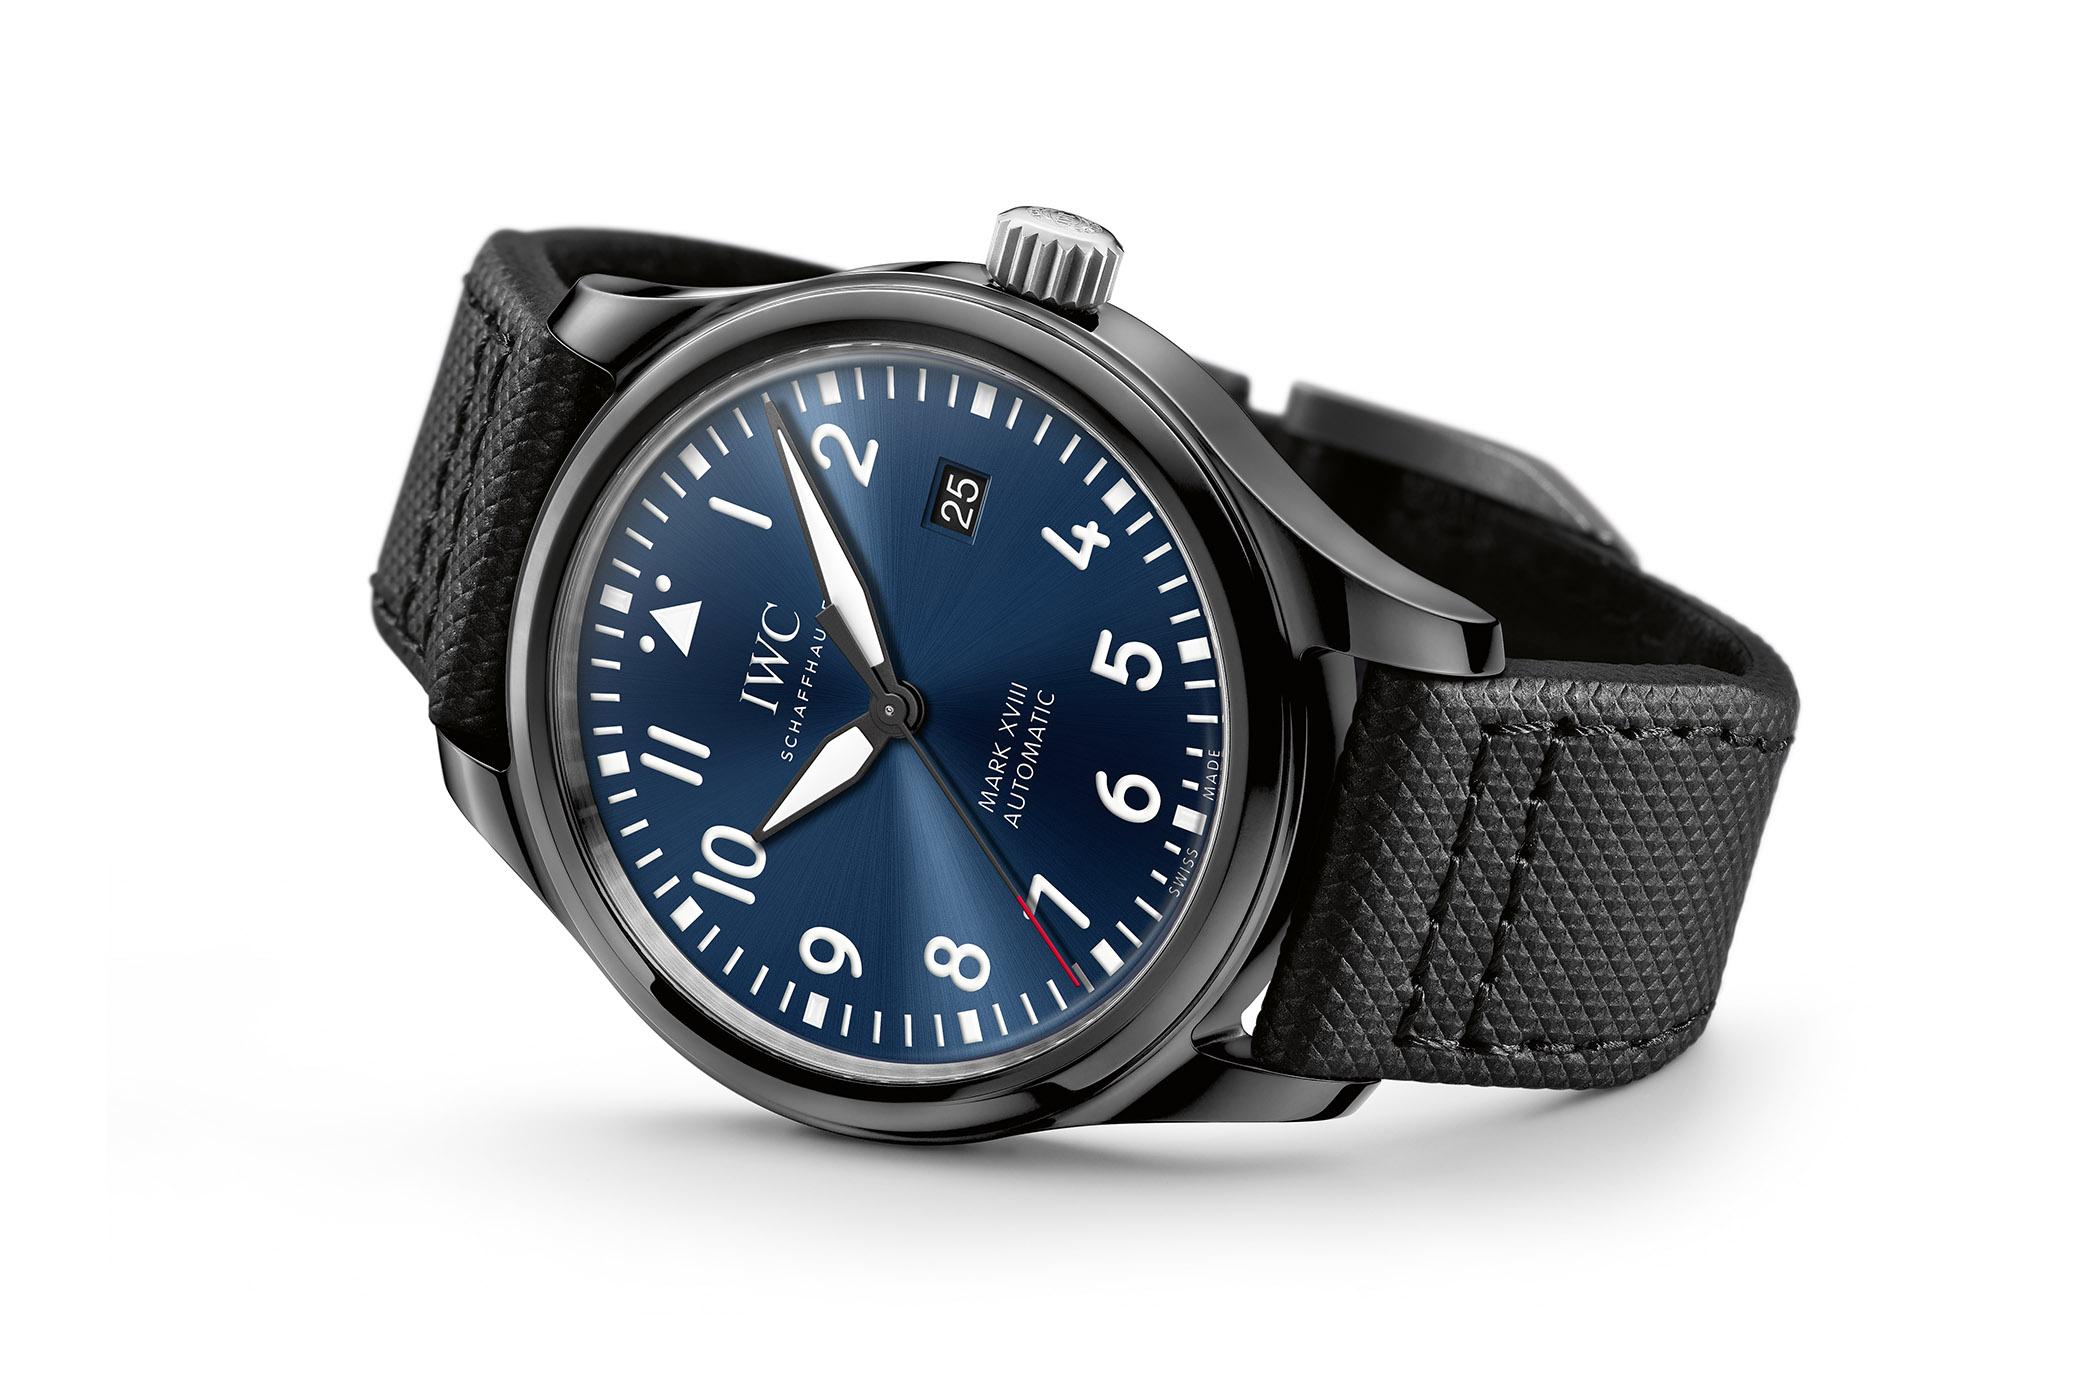 best sneakers 6ca5e a2d60 Introducing - IWC Pilot's Watch Mark XVIII Edition Laureus ...